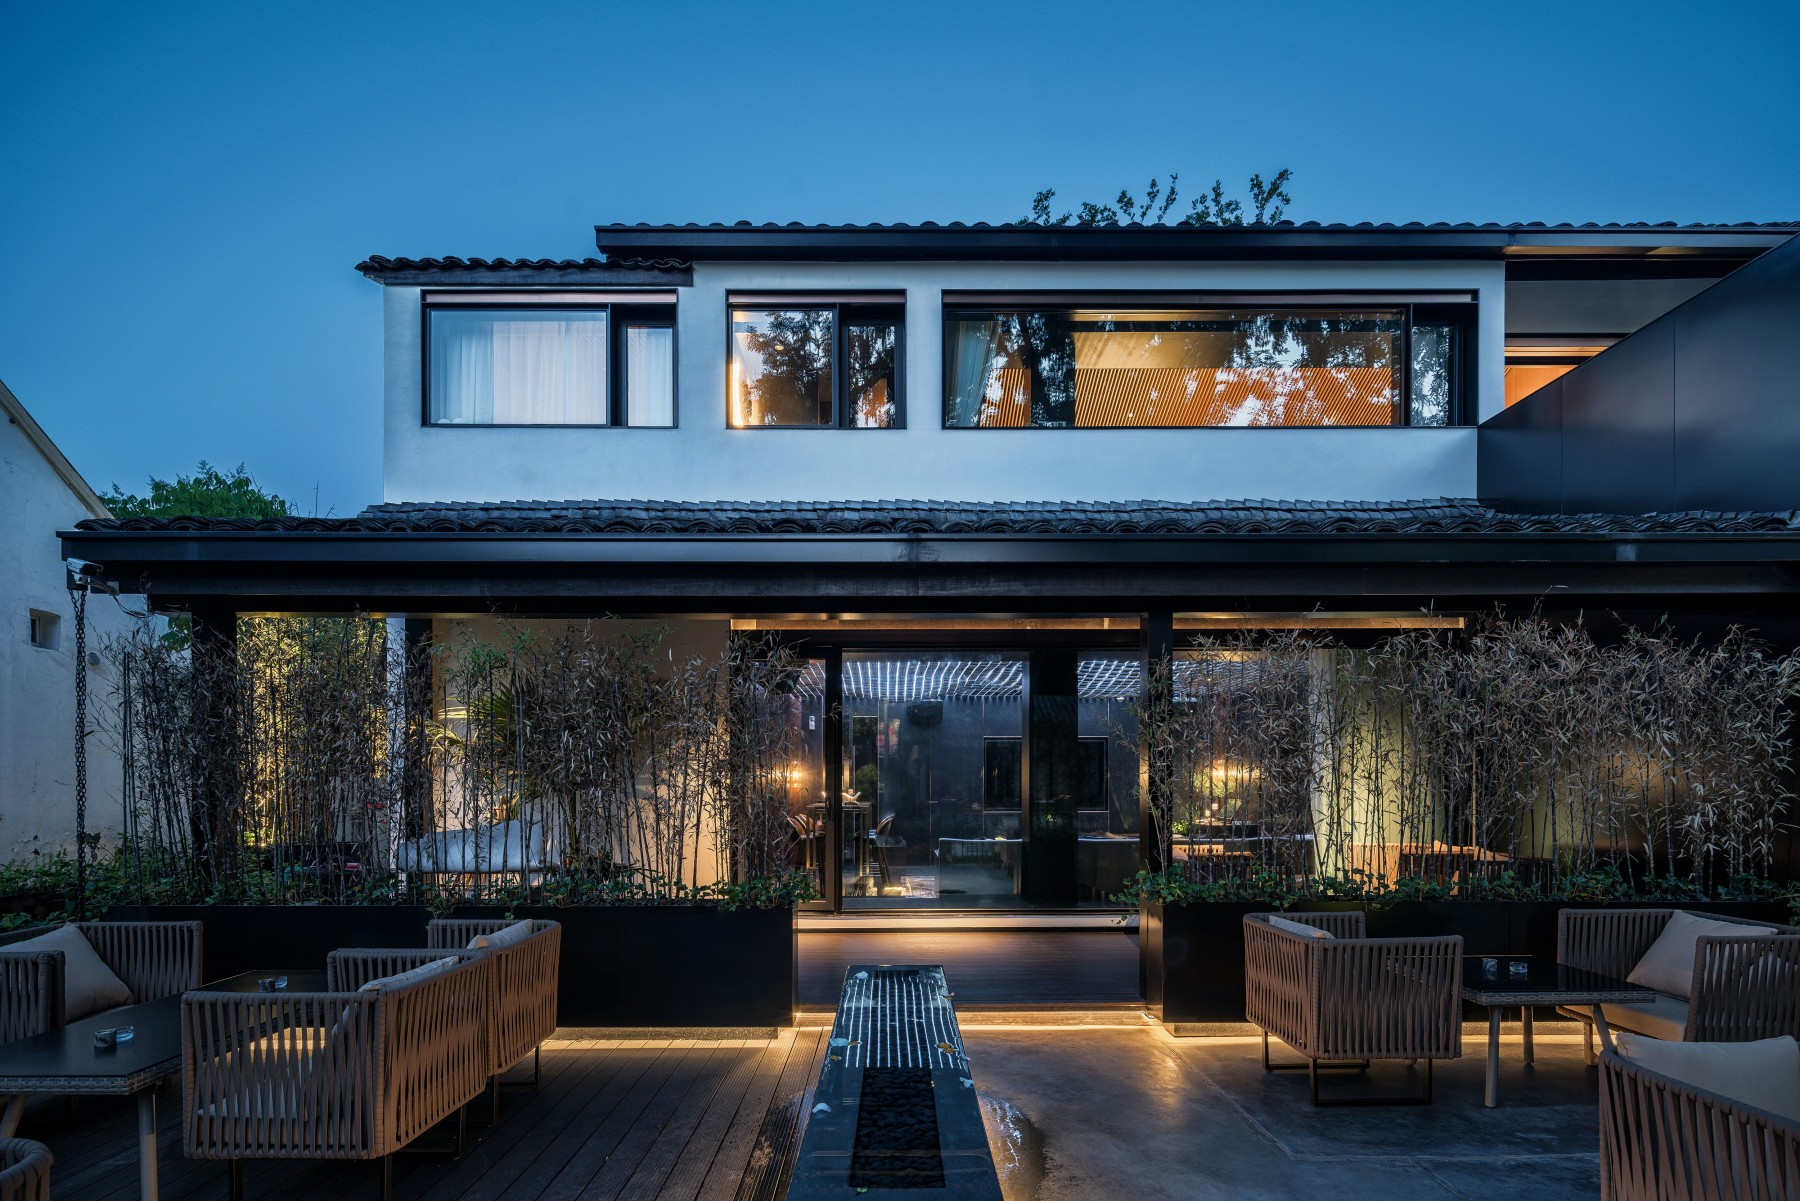 outdoor lighting - Tim Kyle